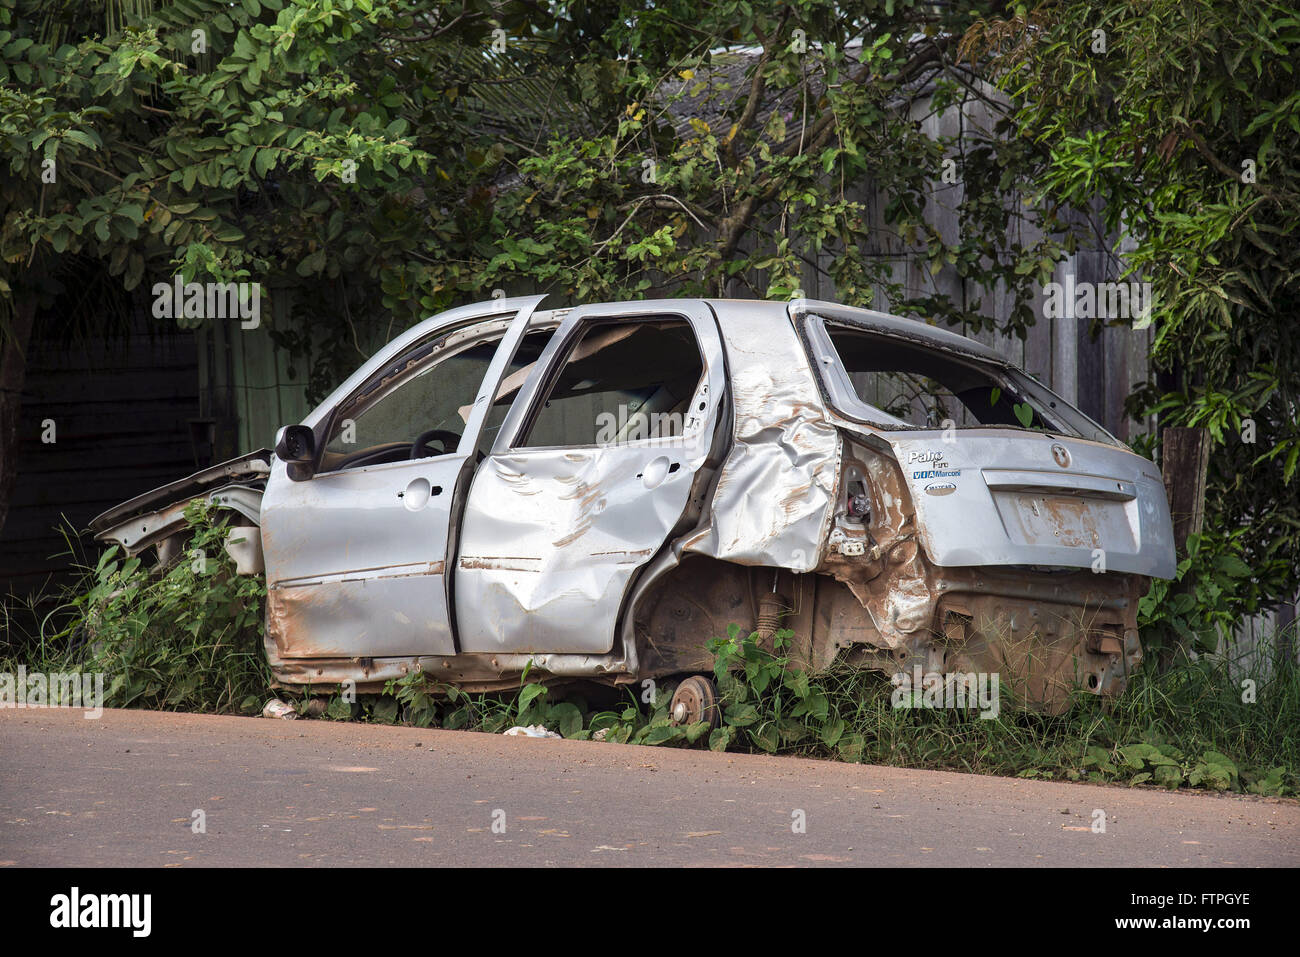 Vehicle abandoned by villager Gutierrez - Stock Image